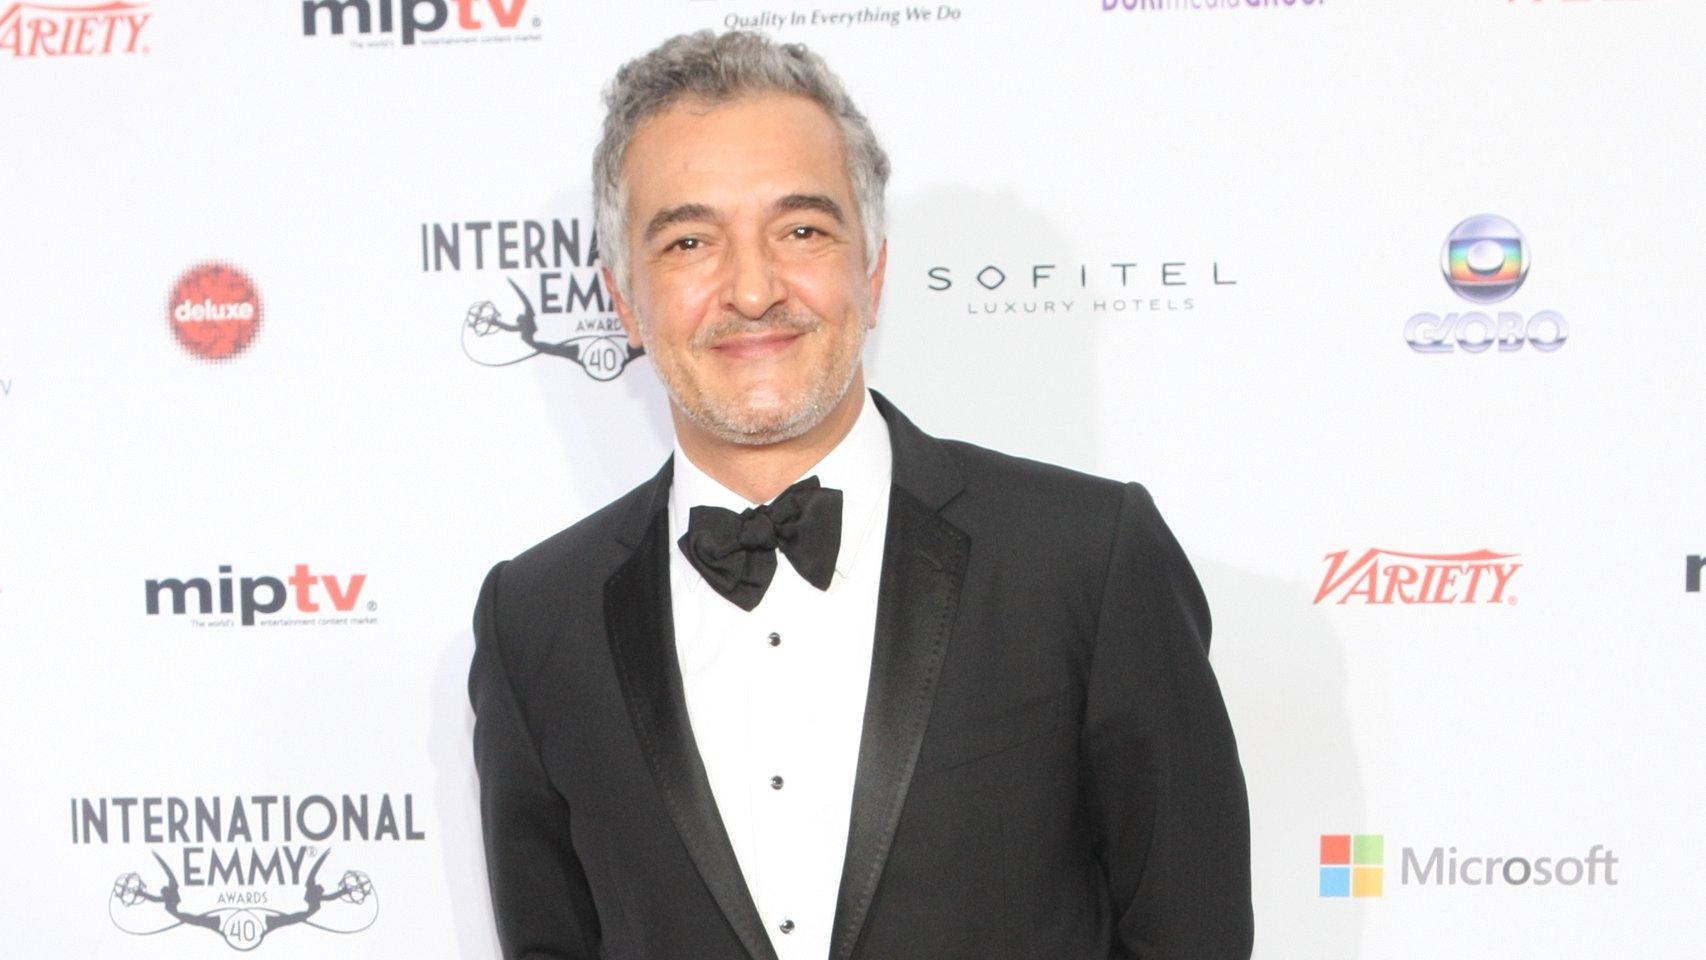 40th Annual International Emmy Awards - Arrivals